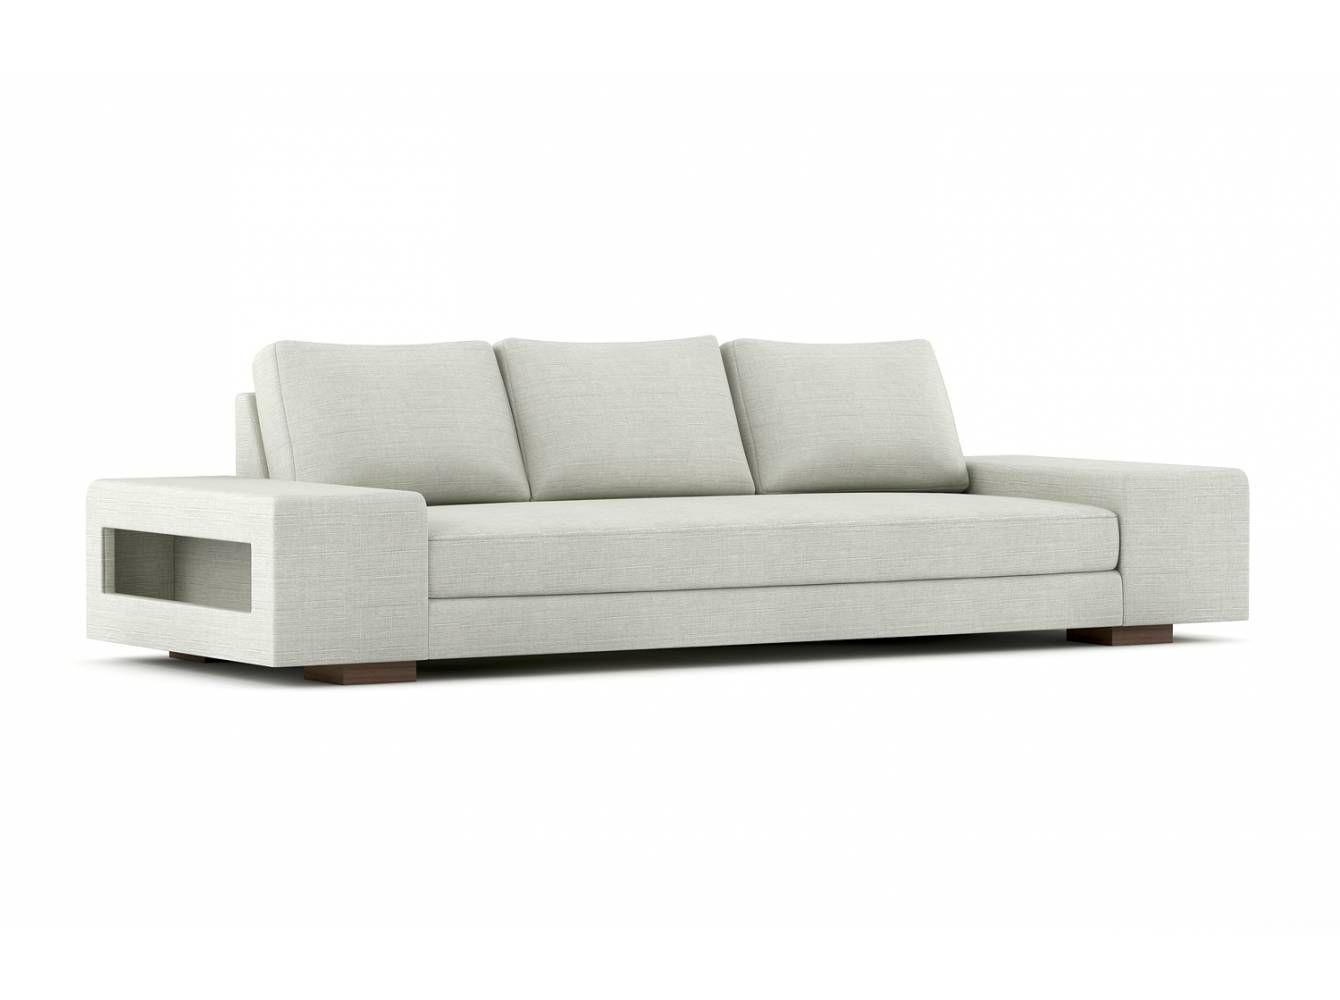 Strata Sofa Xl Sofa Comfortable Sofa Modern Sofa